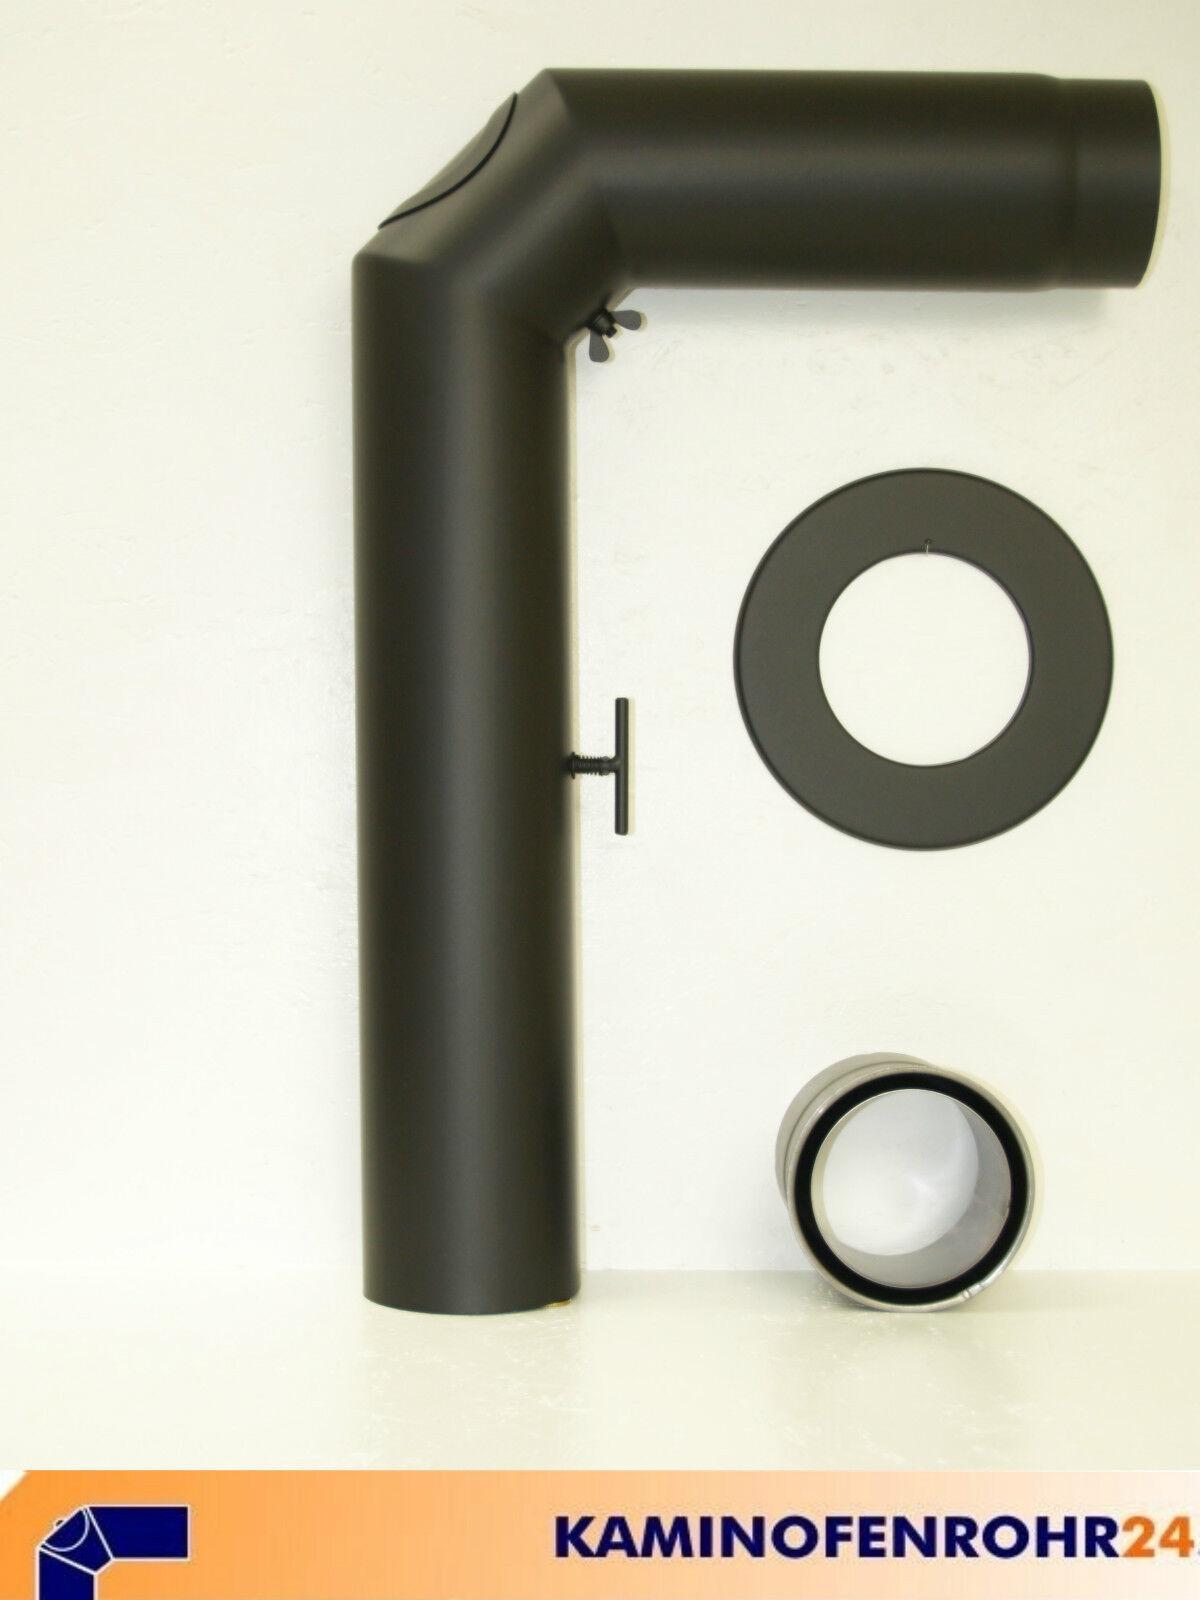 Horno de tubo humo tubo rauchrohrset 3tlg set negro Ø 120 mm ofenrohrset